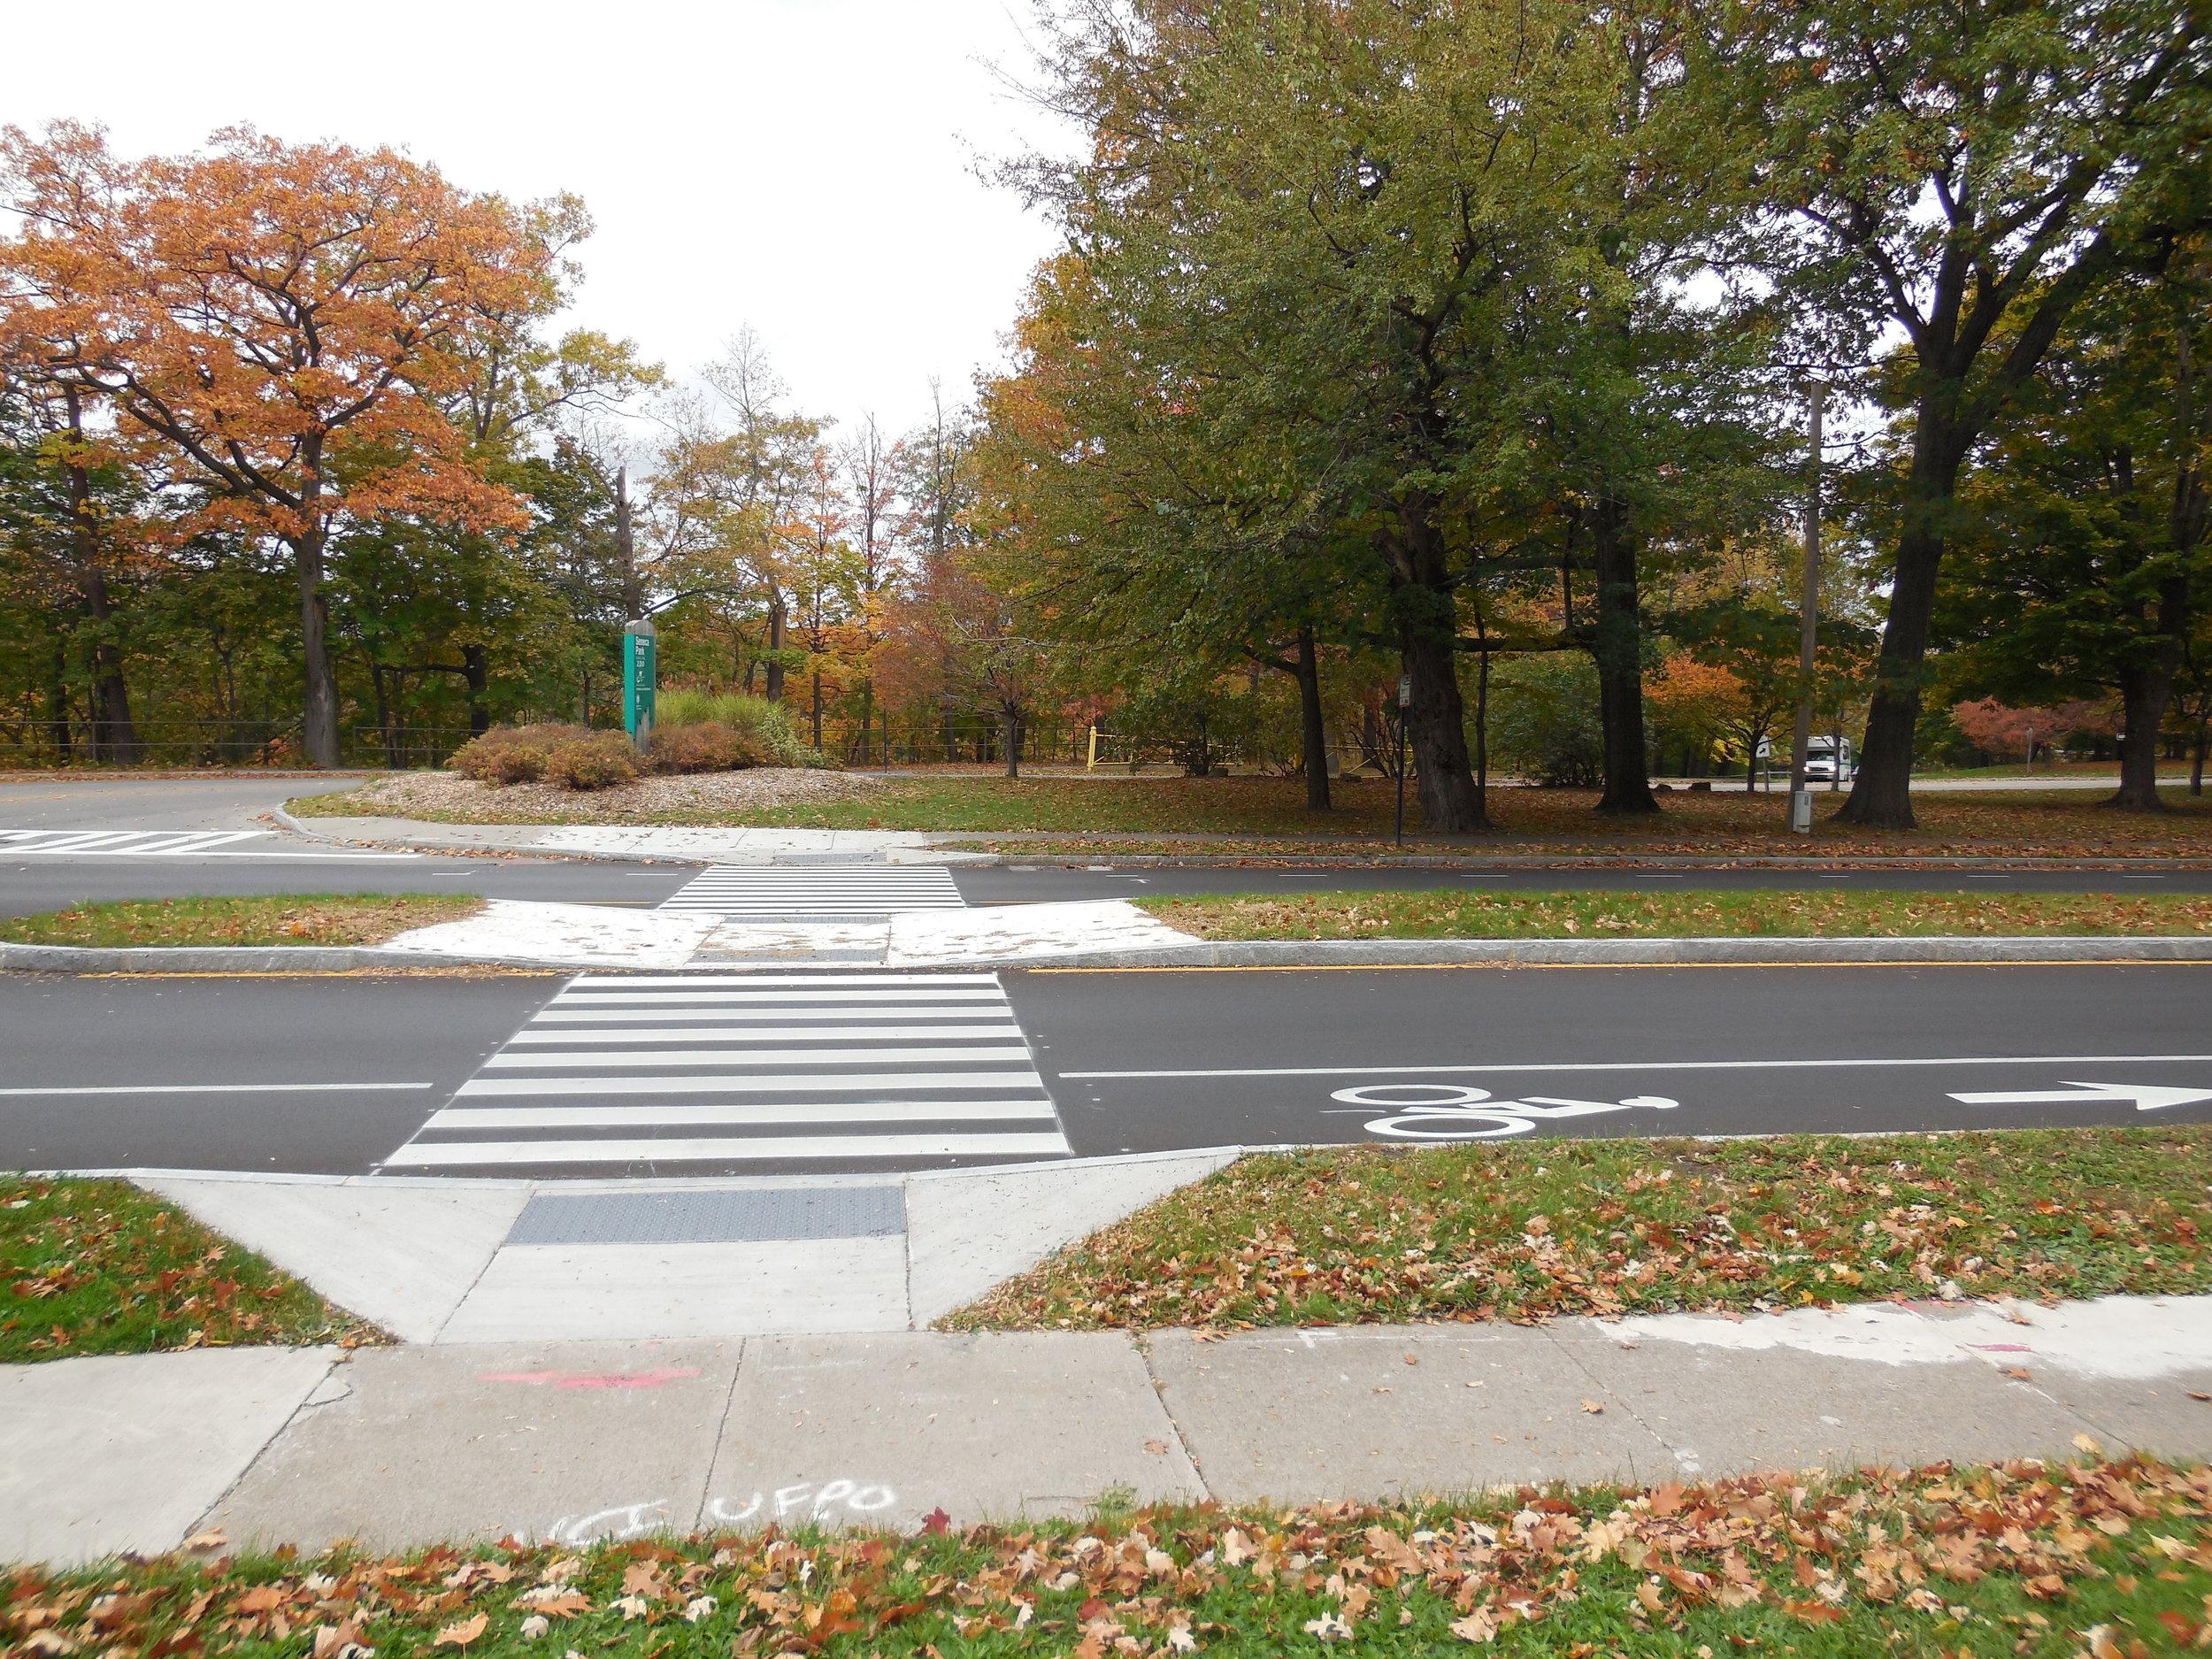 Mid-block Crosswalk with Center Refuge